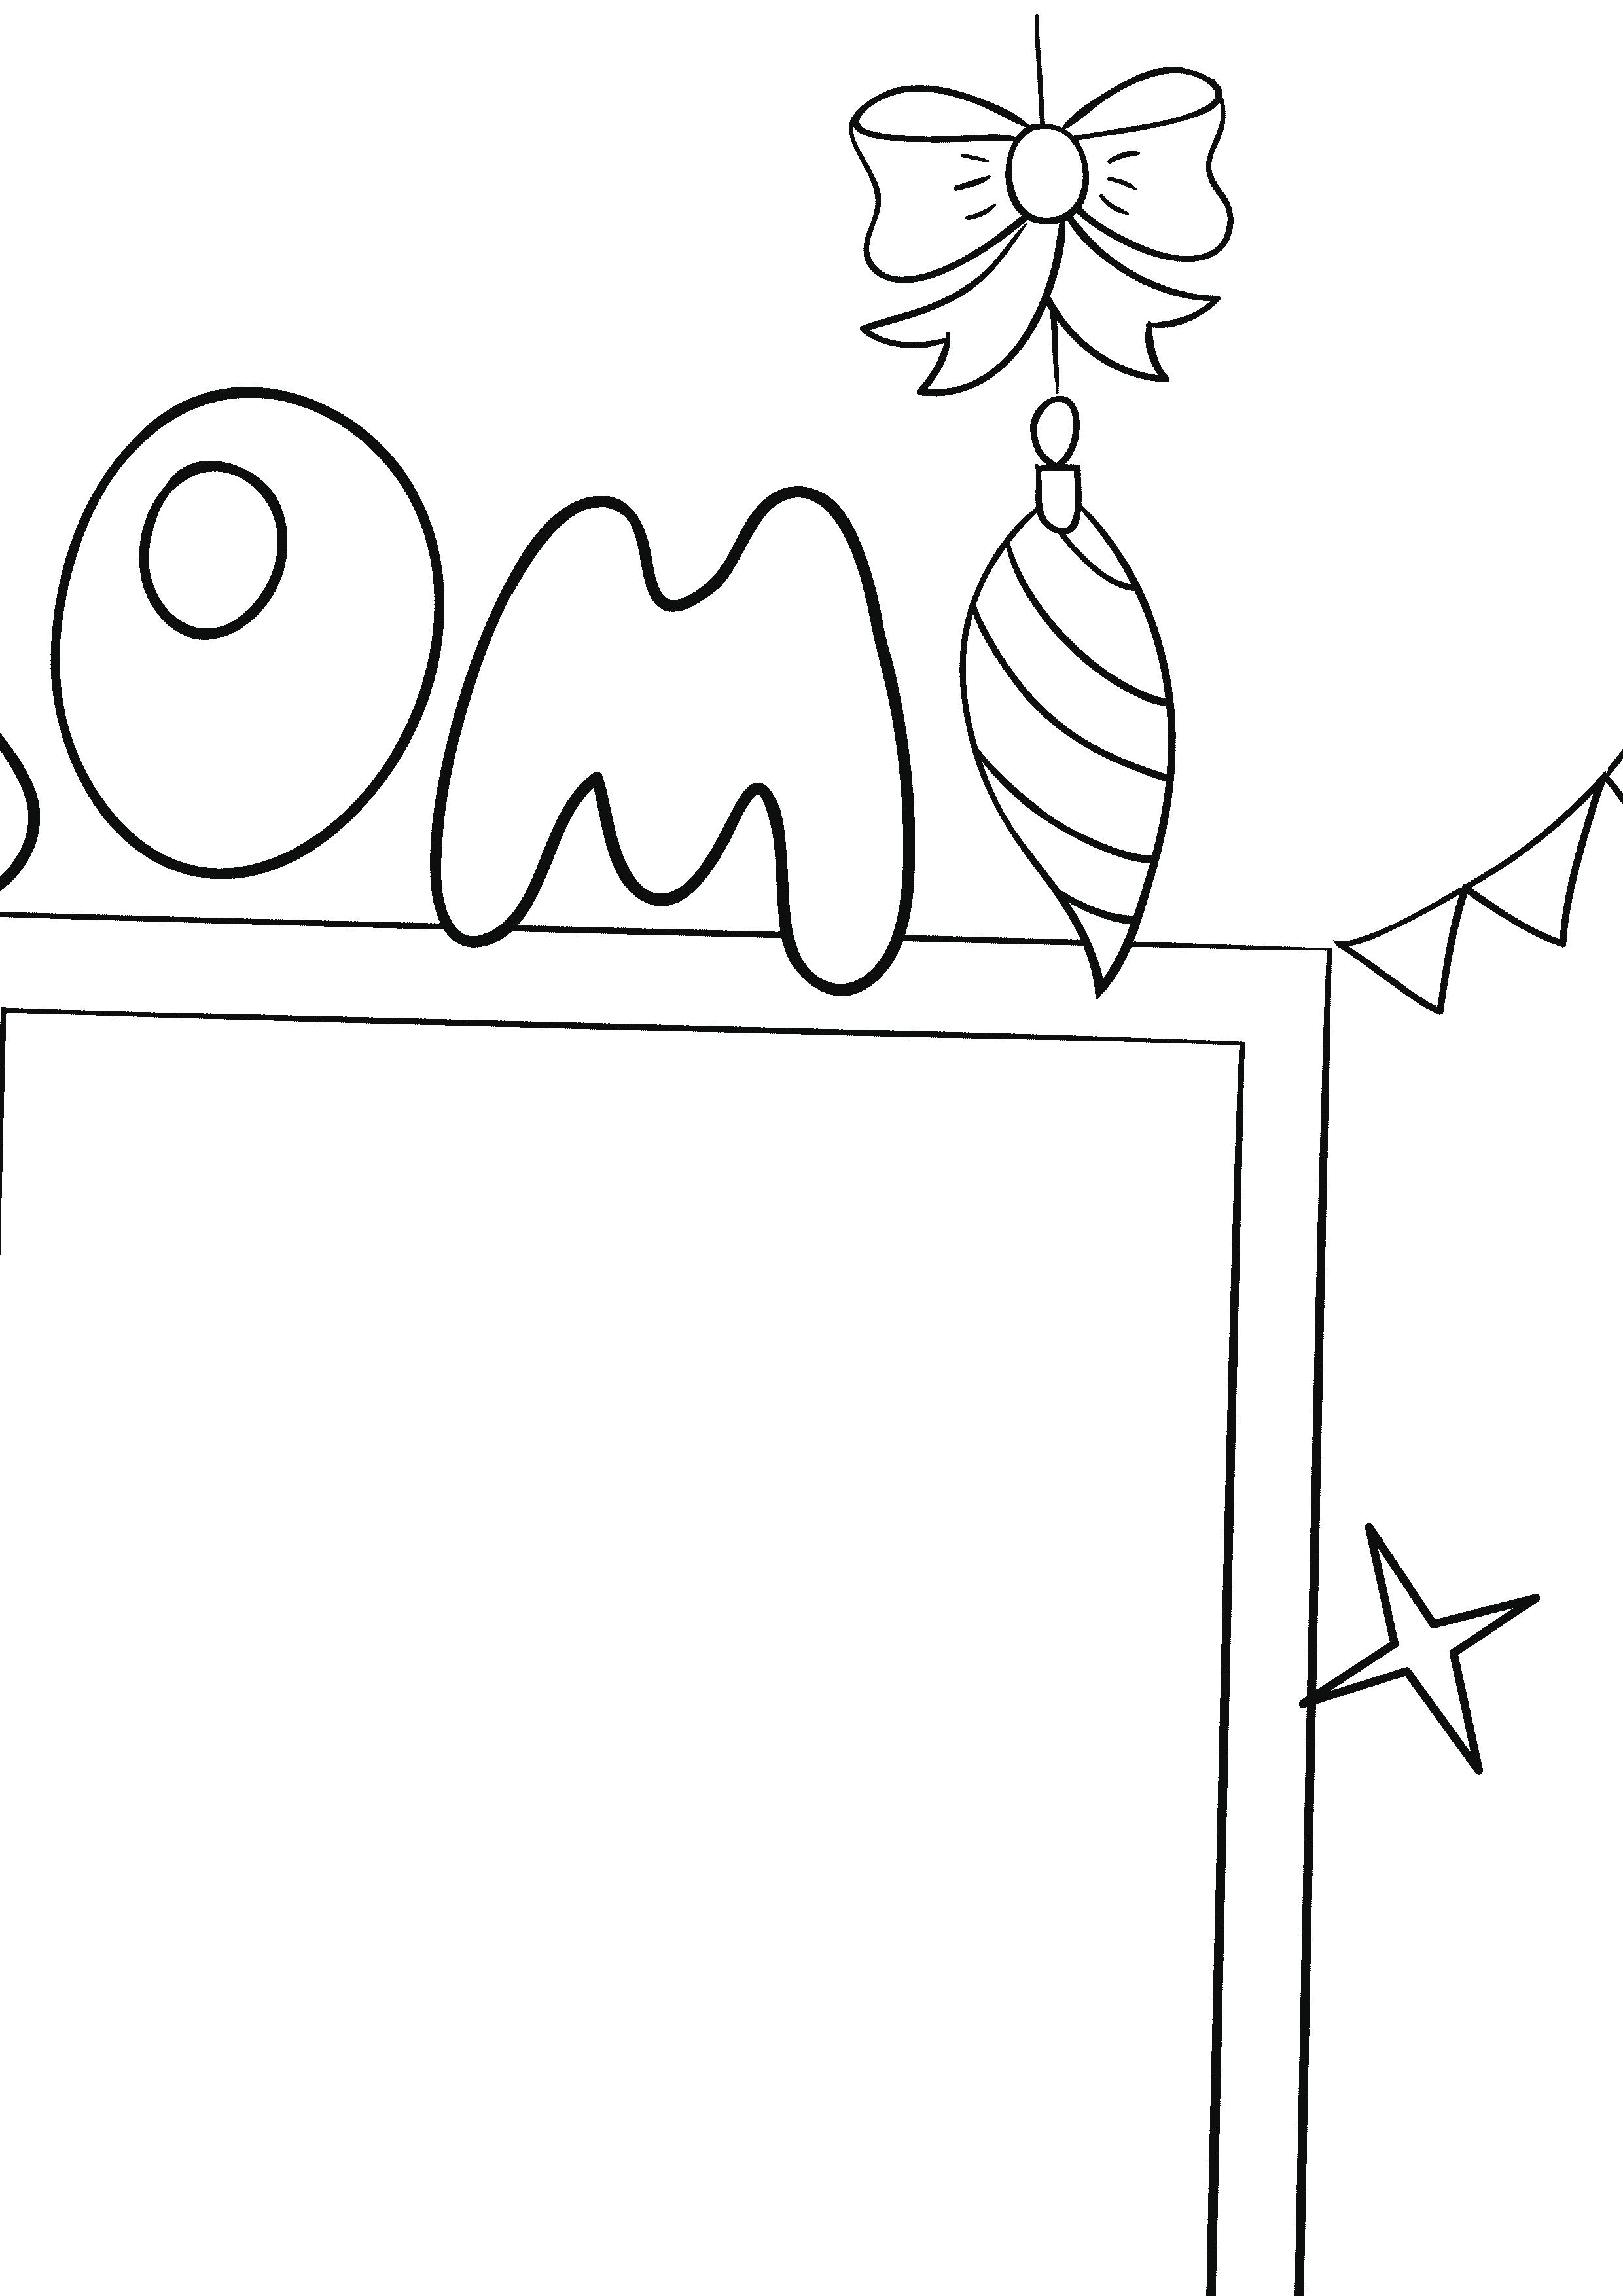 часть-4